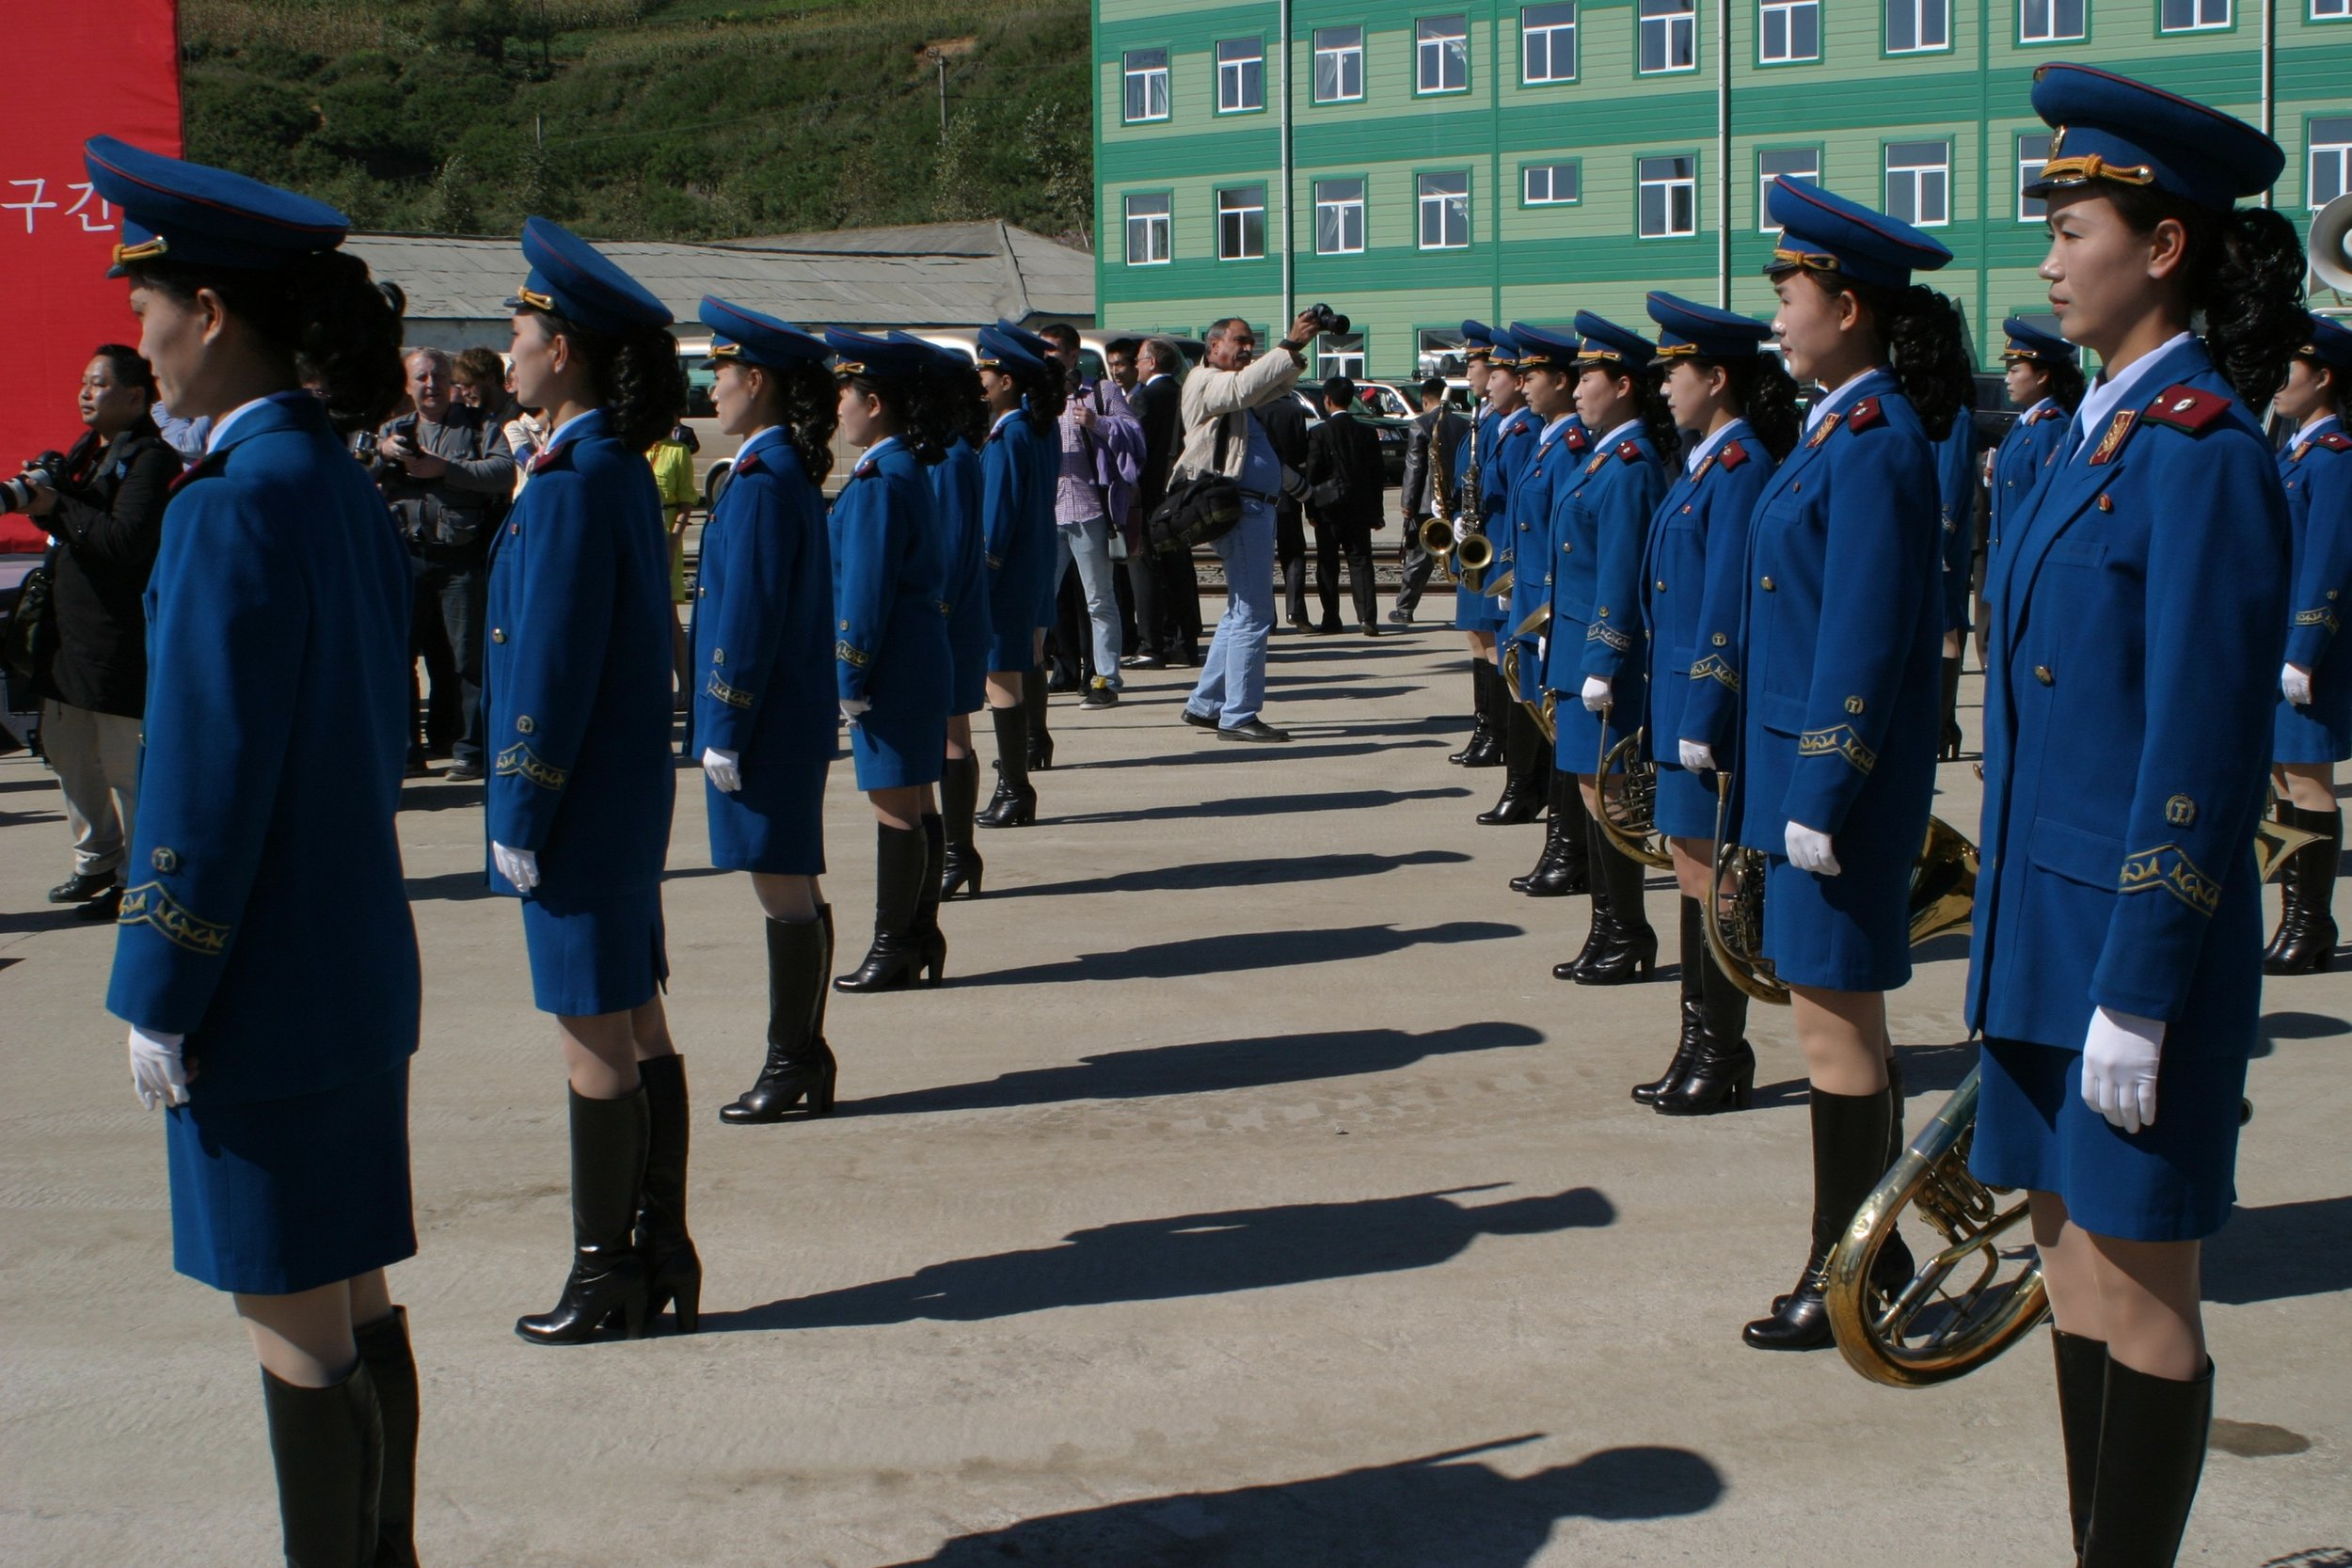 Parade in North Korea - DPRK